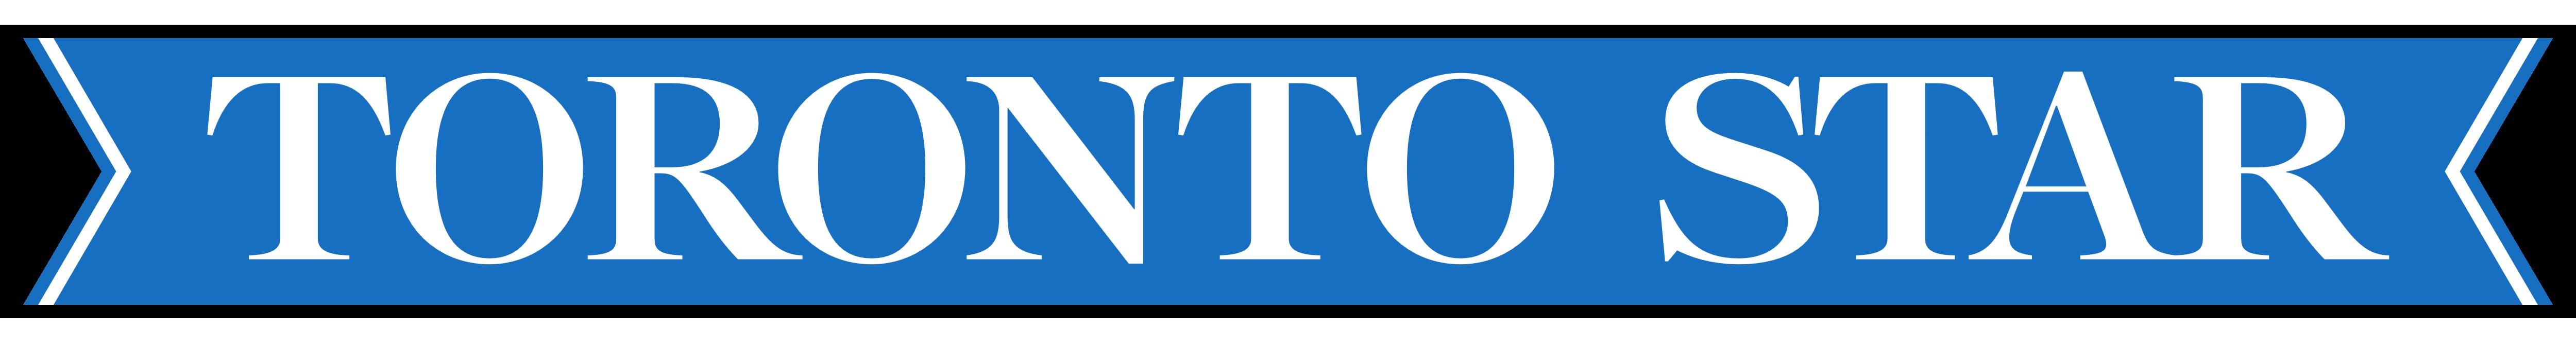 TORONTO STAR NEWS